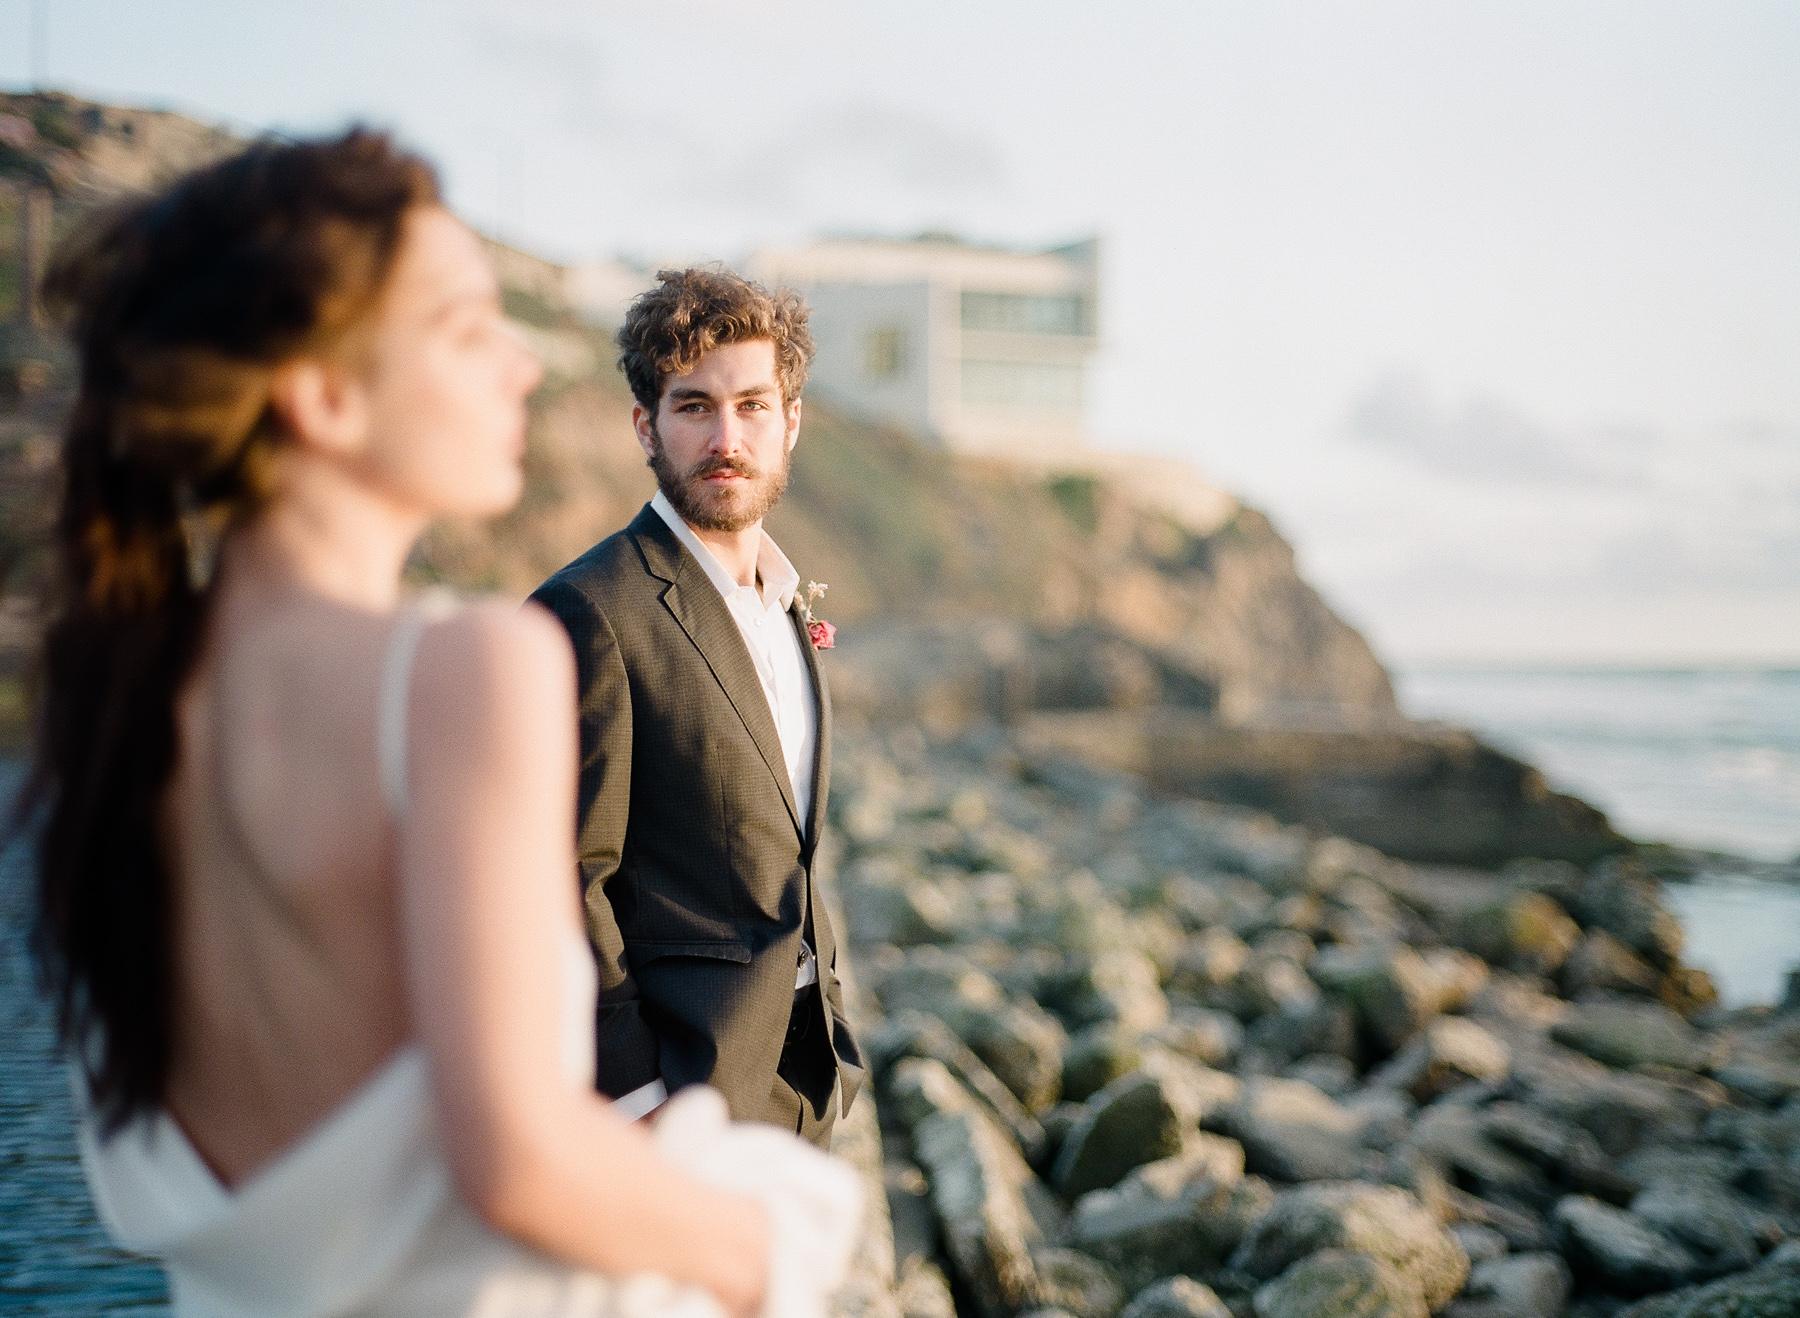 San-Francisco-Wedding-Film-Photography-34.jpg